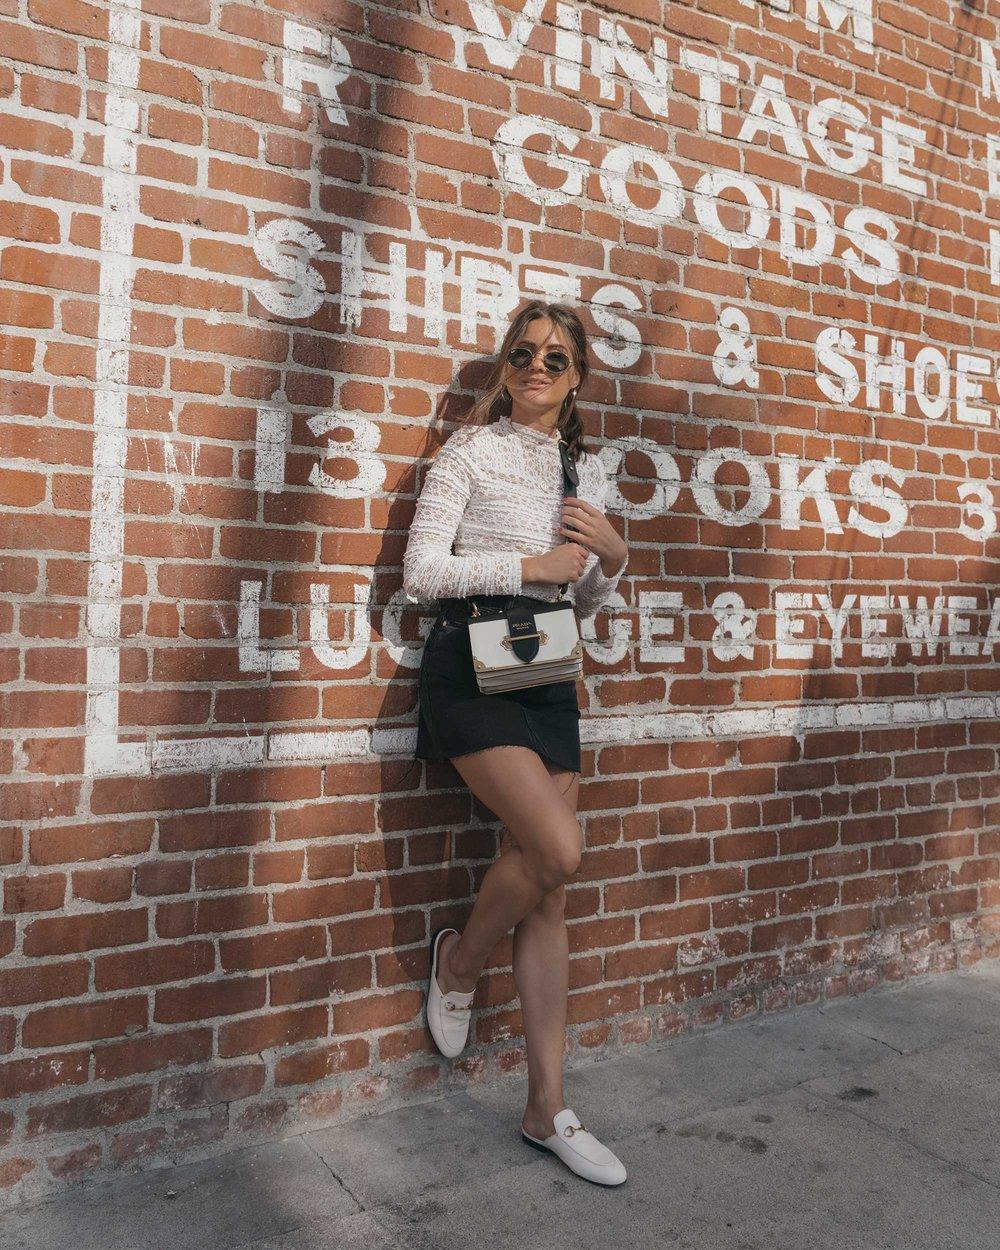 Prada City Saffiano Leather Cahier Bag, Black Denim Skirt, Summer outfit, Abbot Kinney California12.jpg